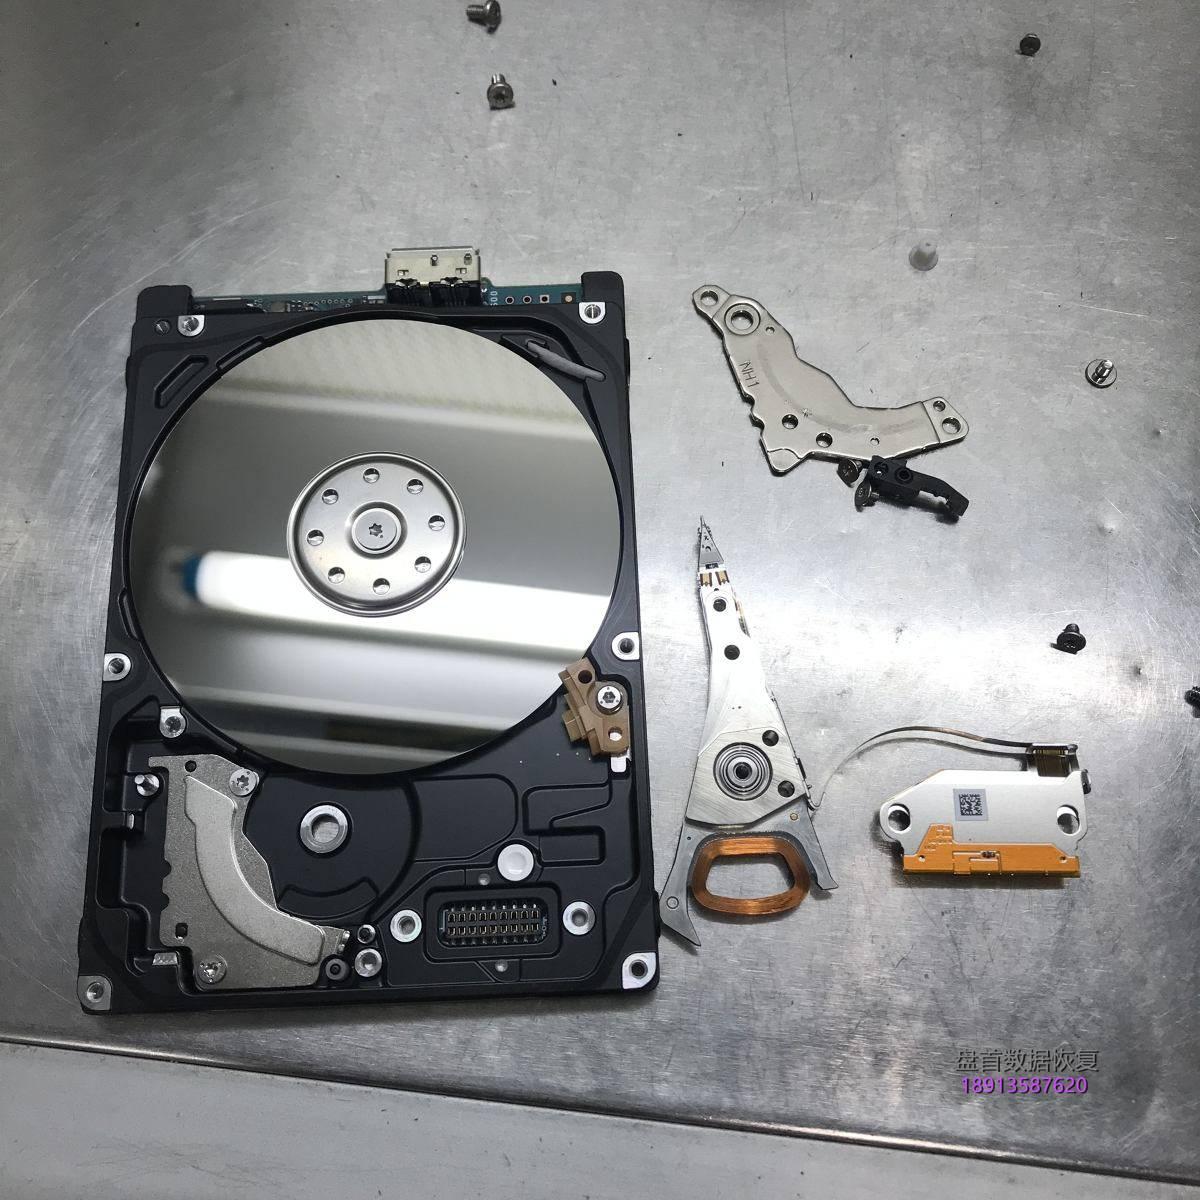 TOSHIBA MQ04UBF100东芝移动硬盘磁头异响开盘数据恢复